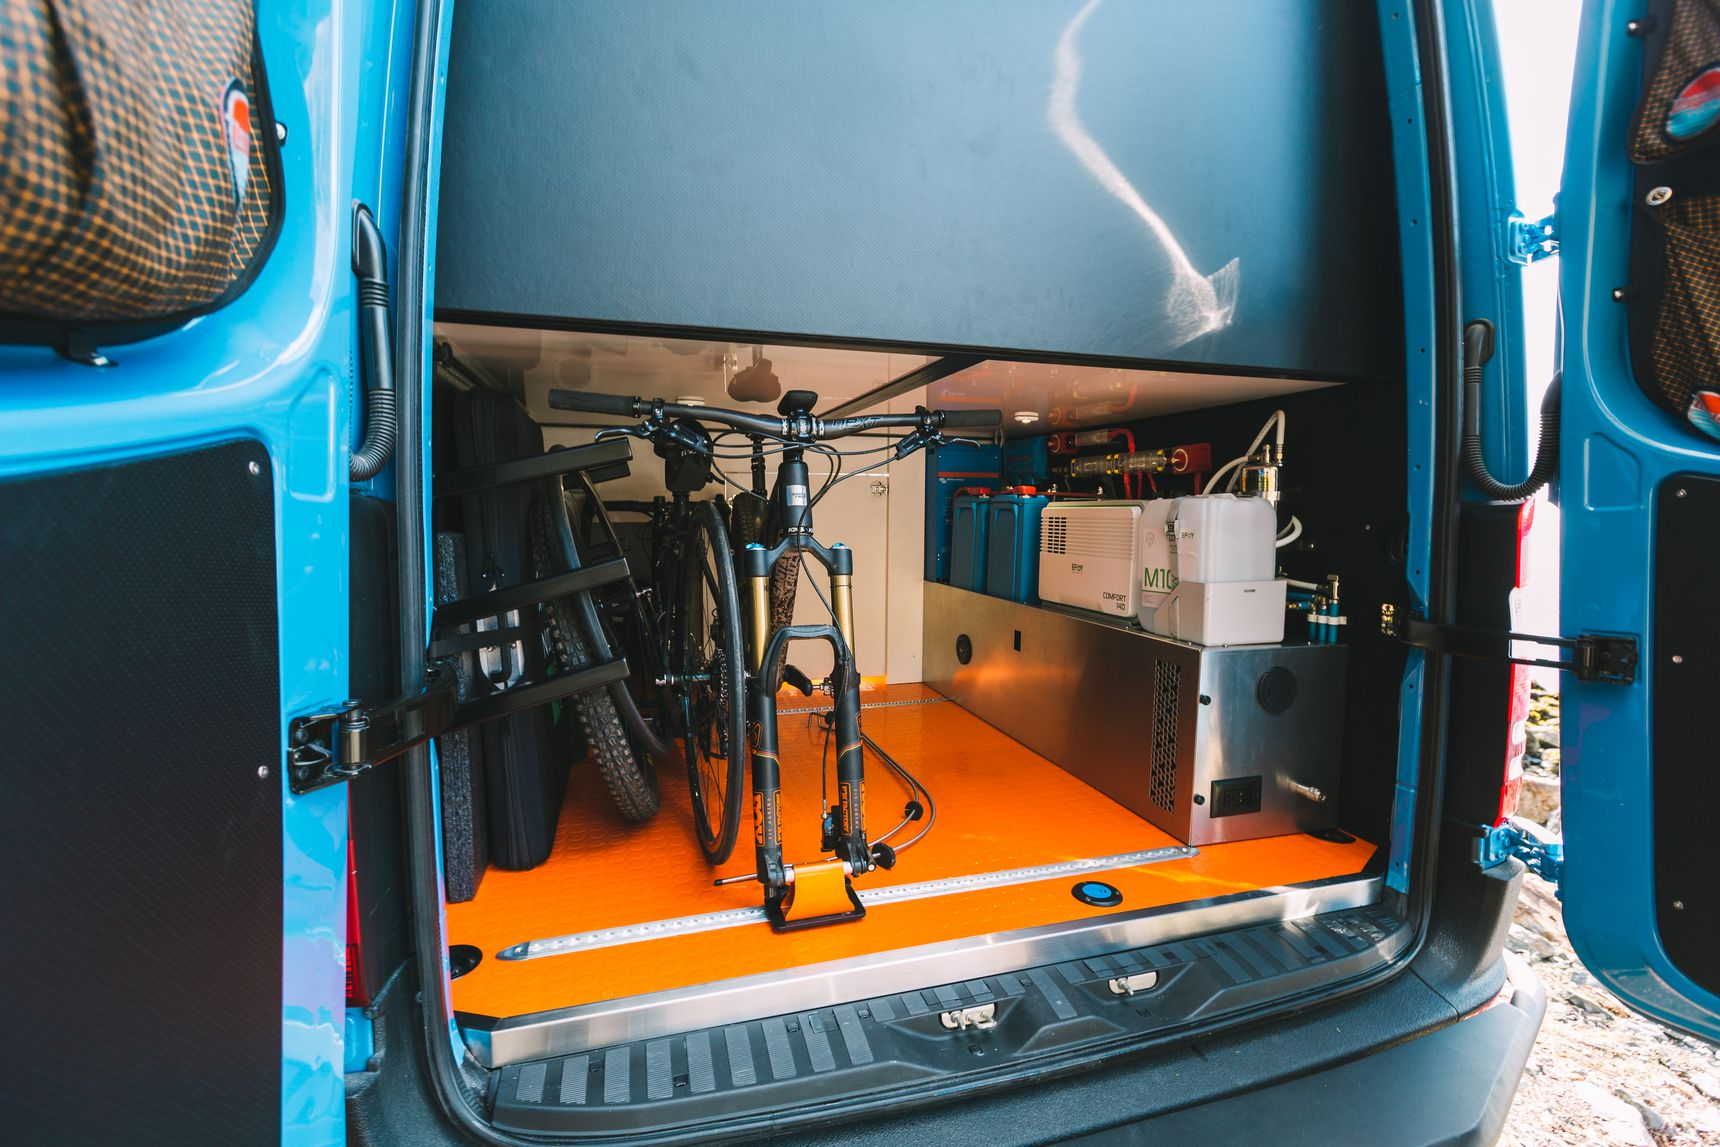 Off Grid home - Bike storage